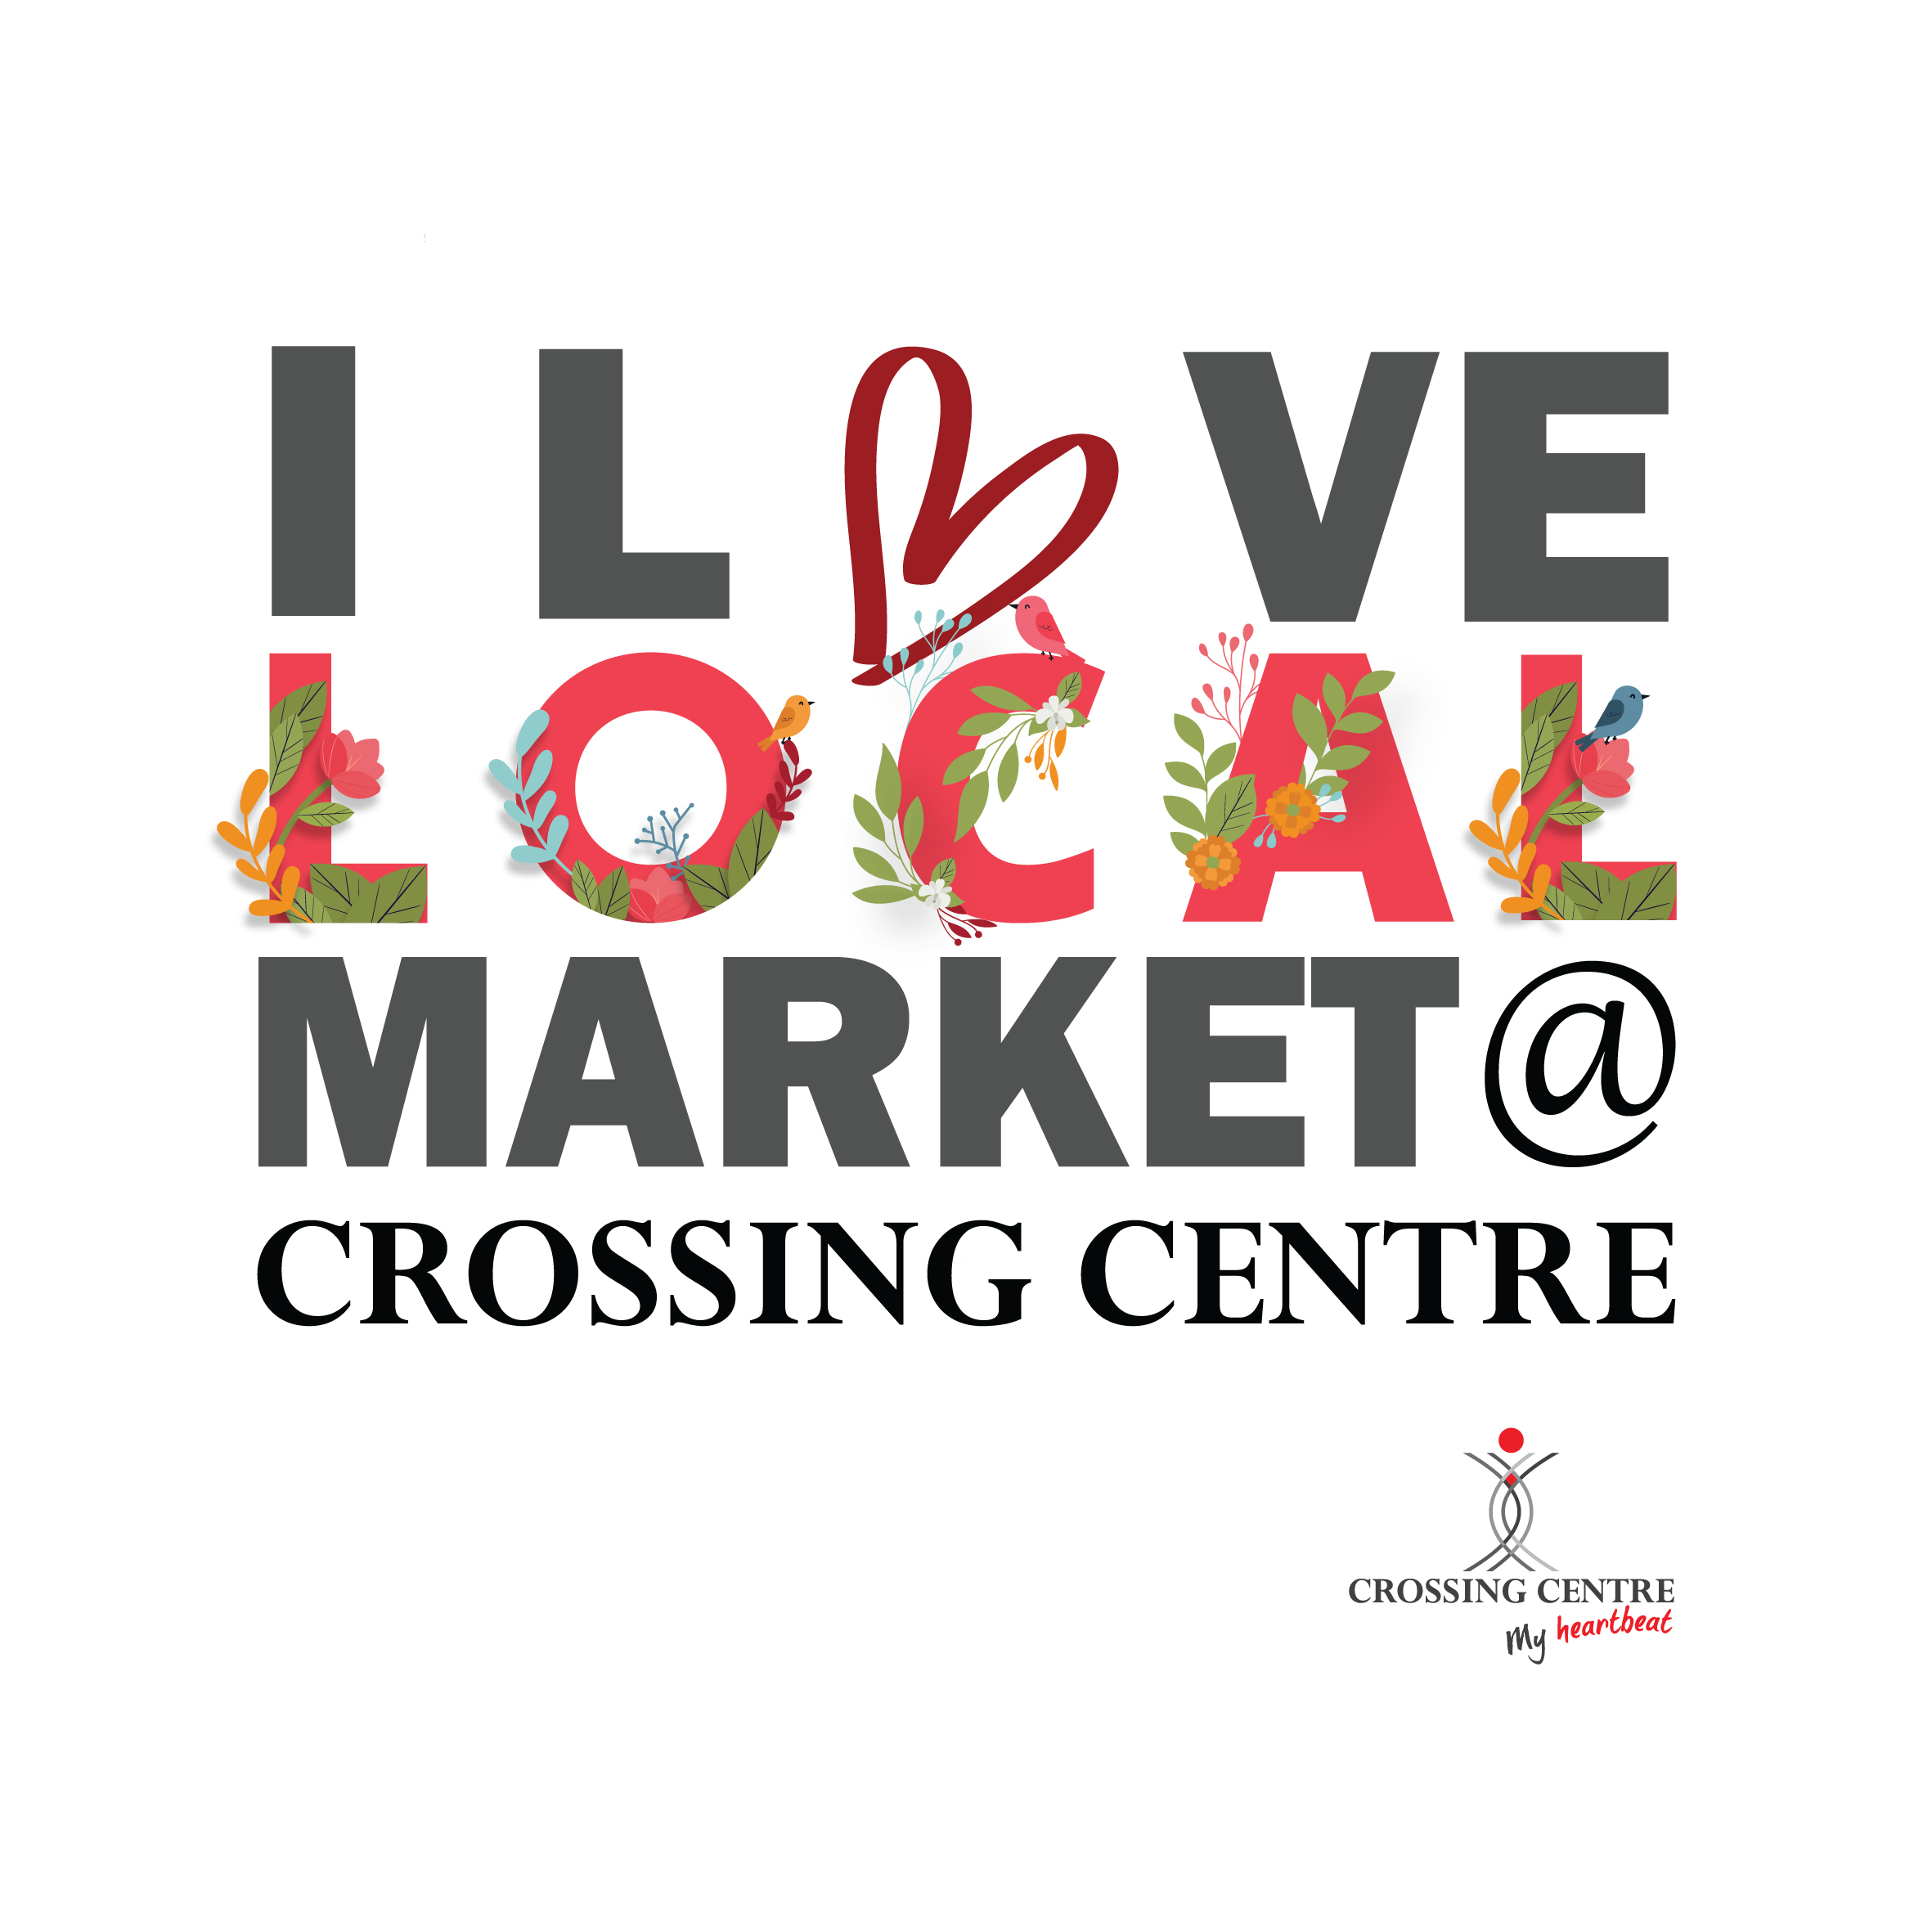 It's Market Day @ Crossing Centre, Nelspruit